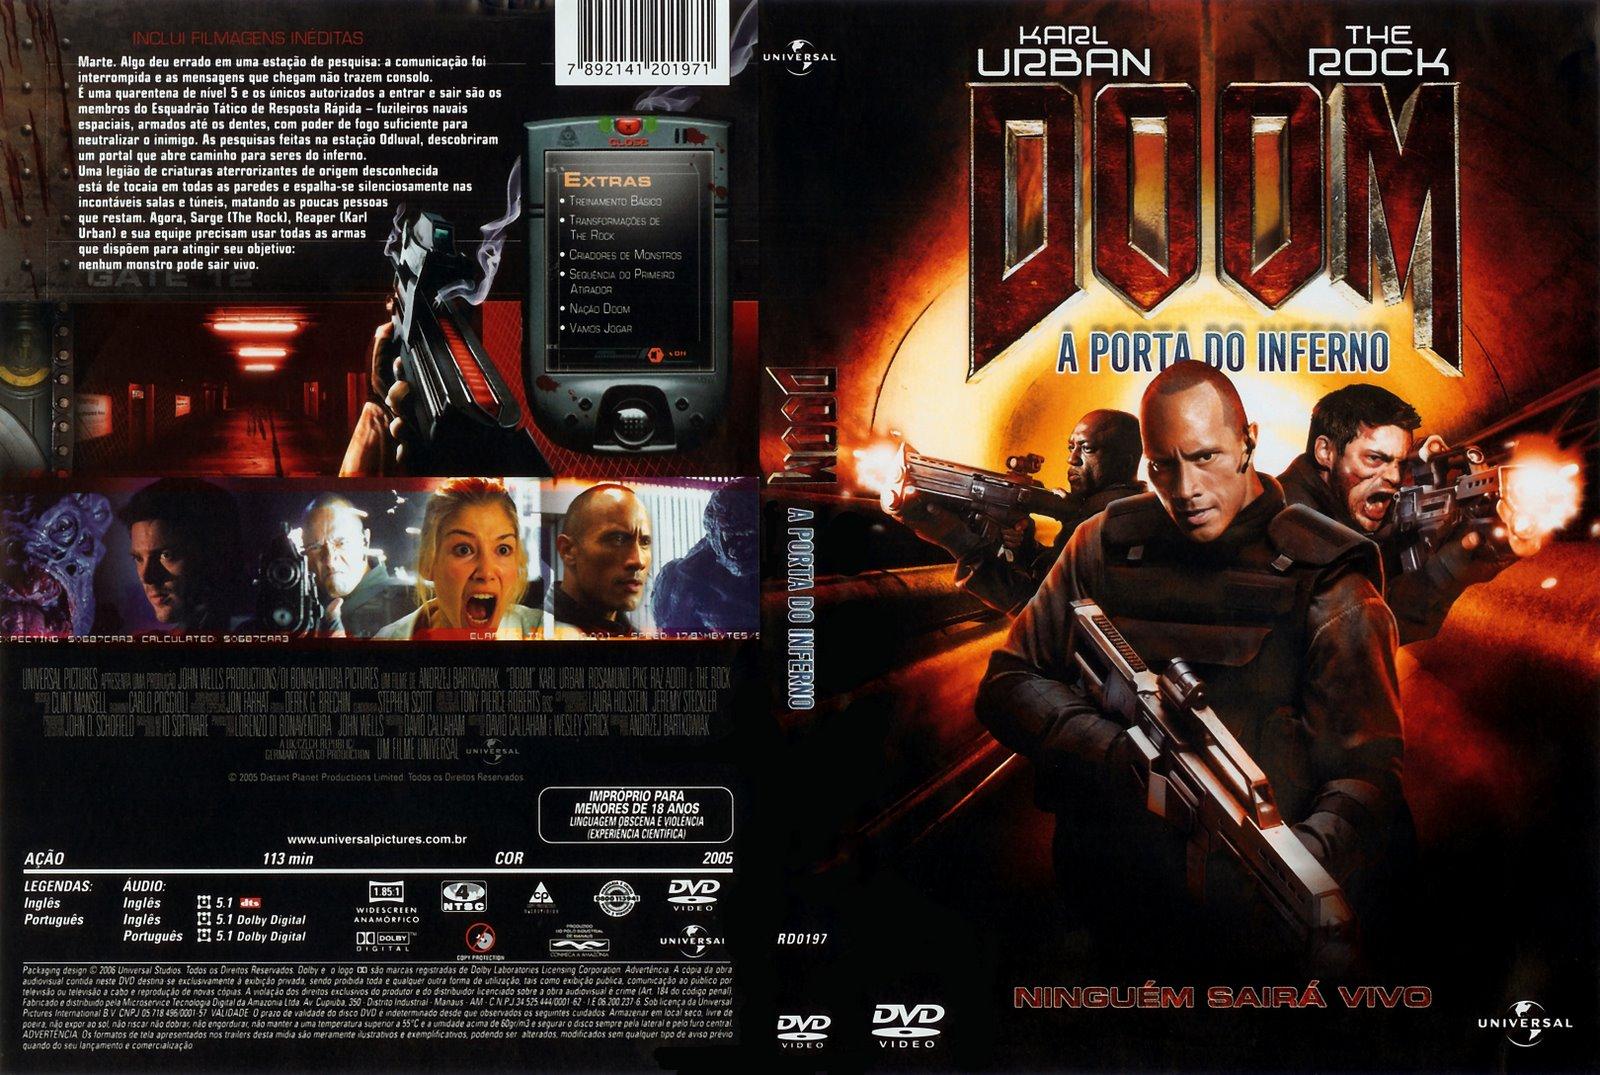 http://3.bp.blogspot.com/_pnOdTUC4iSY/TDM6qKKhcDI/AAAAAAAAAD0/I_BIXXZS_vg/s1600/Doom+a+posrta+do+inferno.jpg